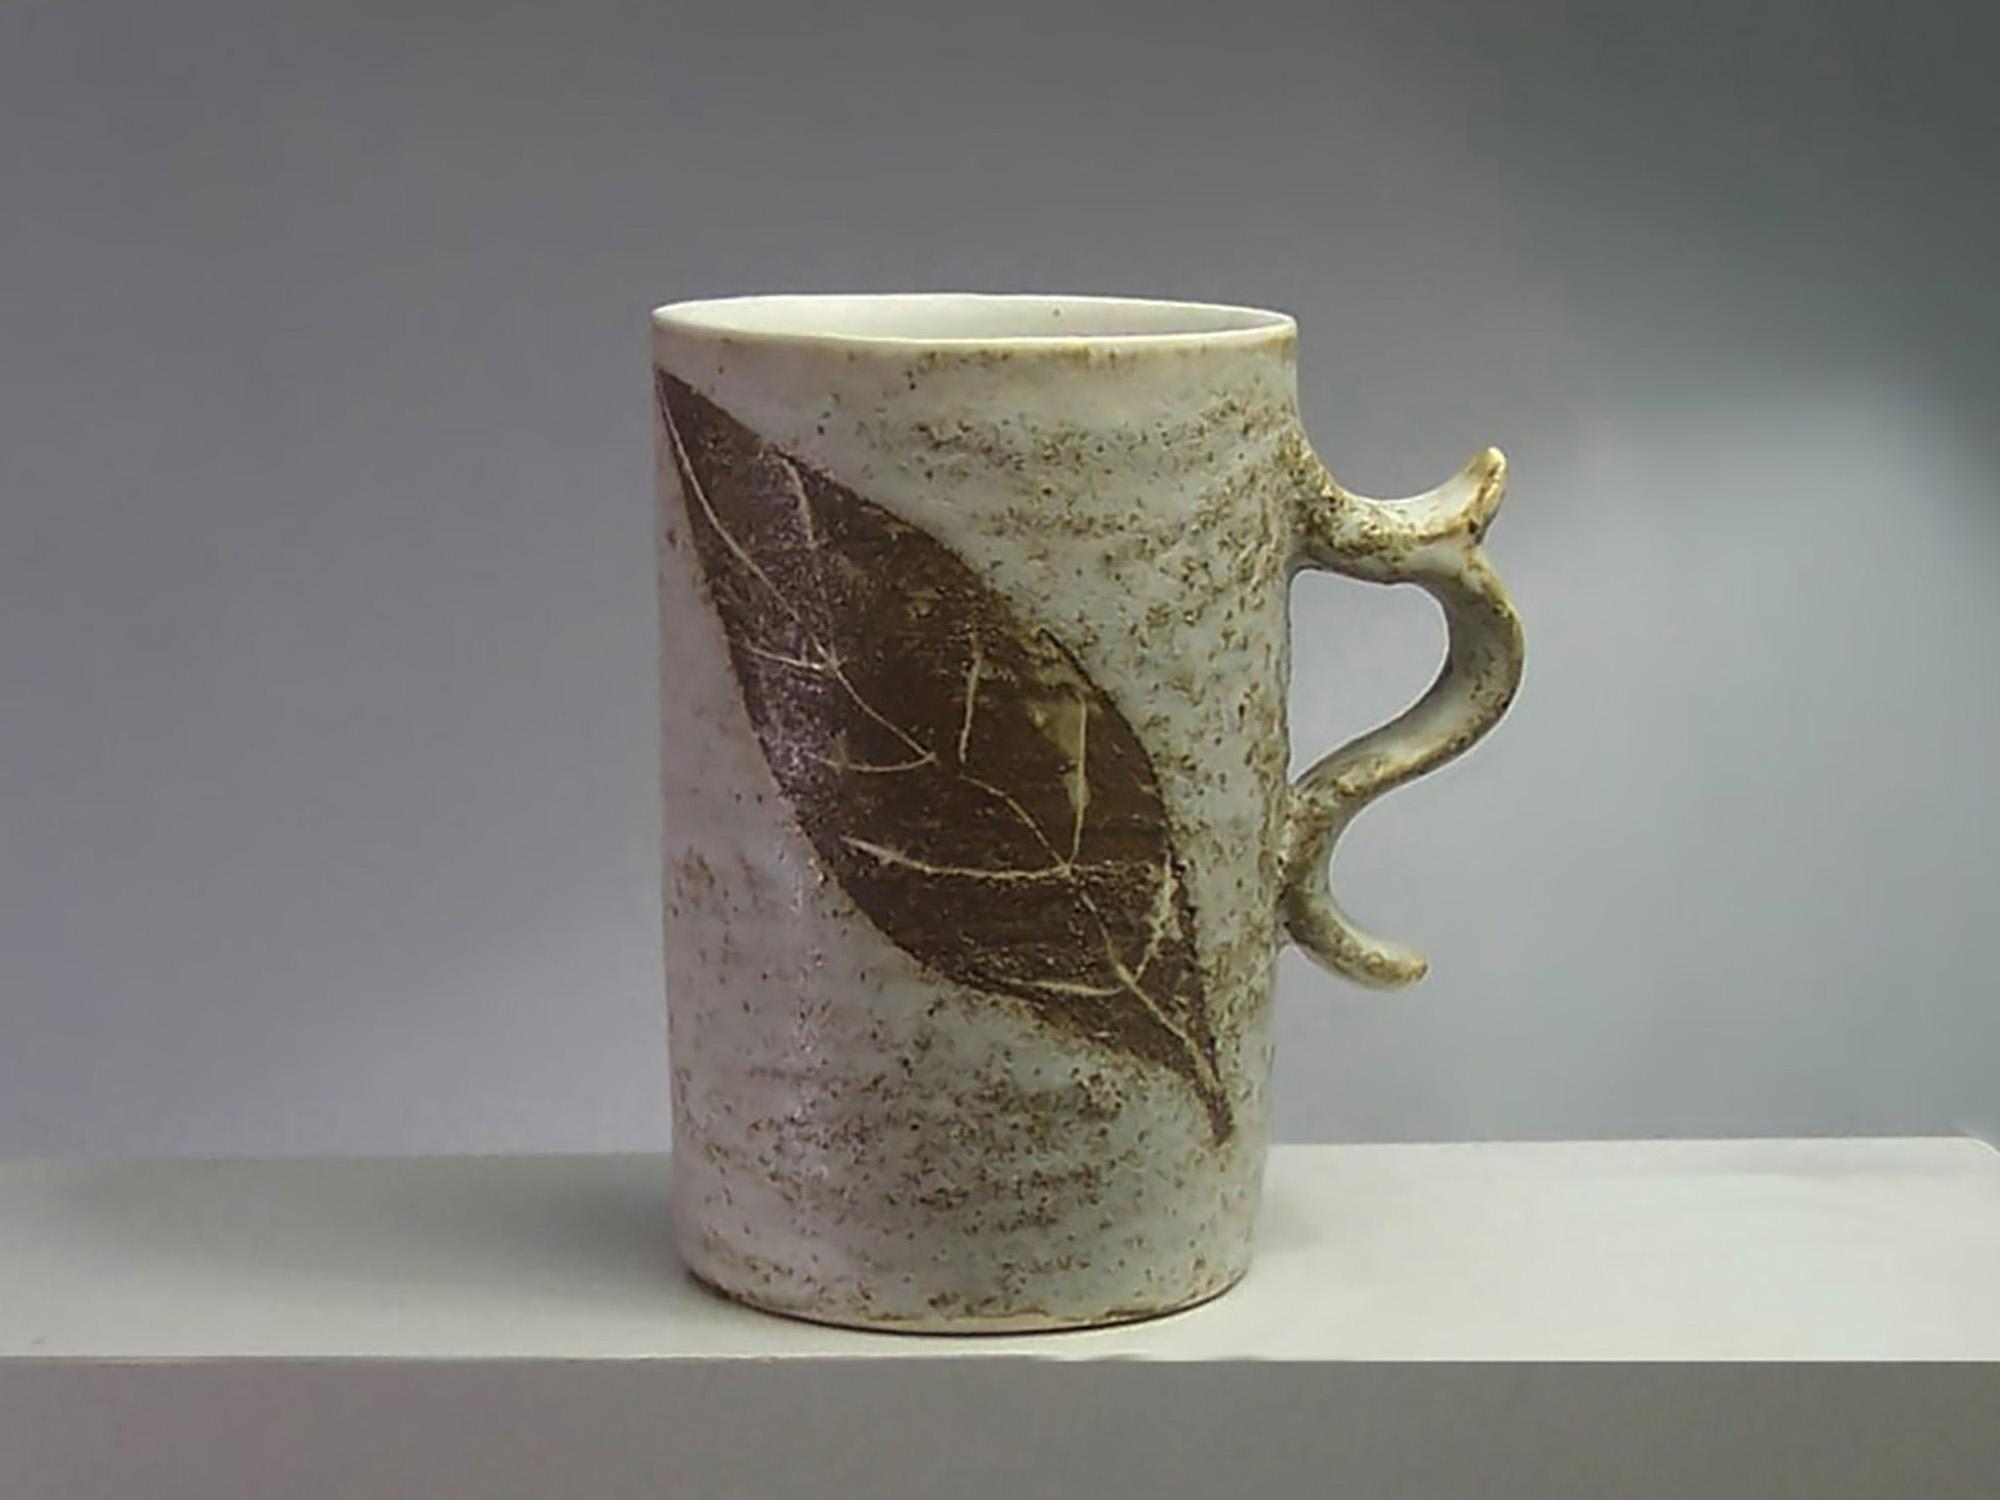 Tall Gingerbread Mug in Brown Lwaf Motif by Mackenzie